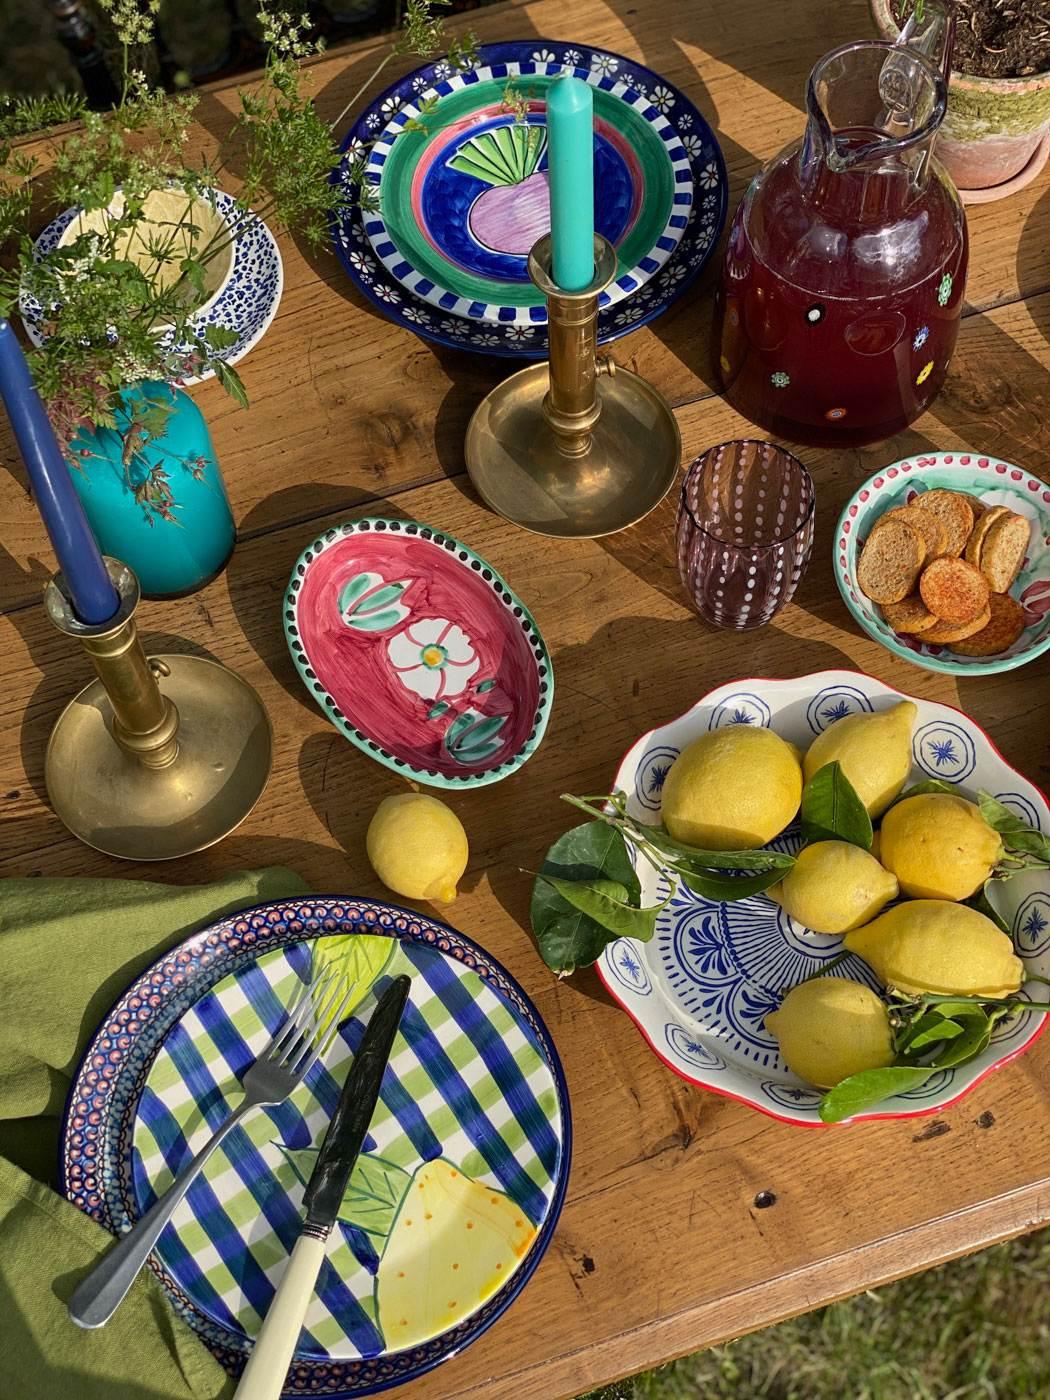 dresser-une-table-italienne-art-de-vivre-al-fresco